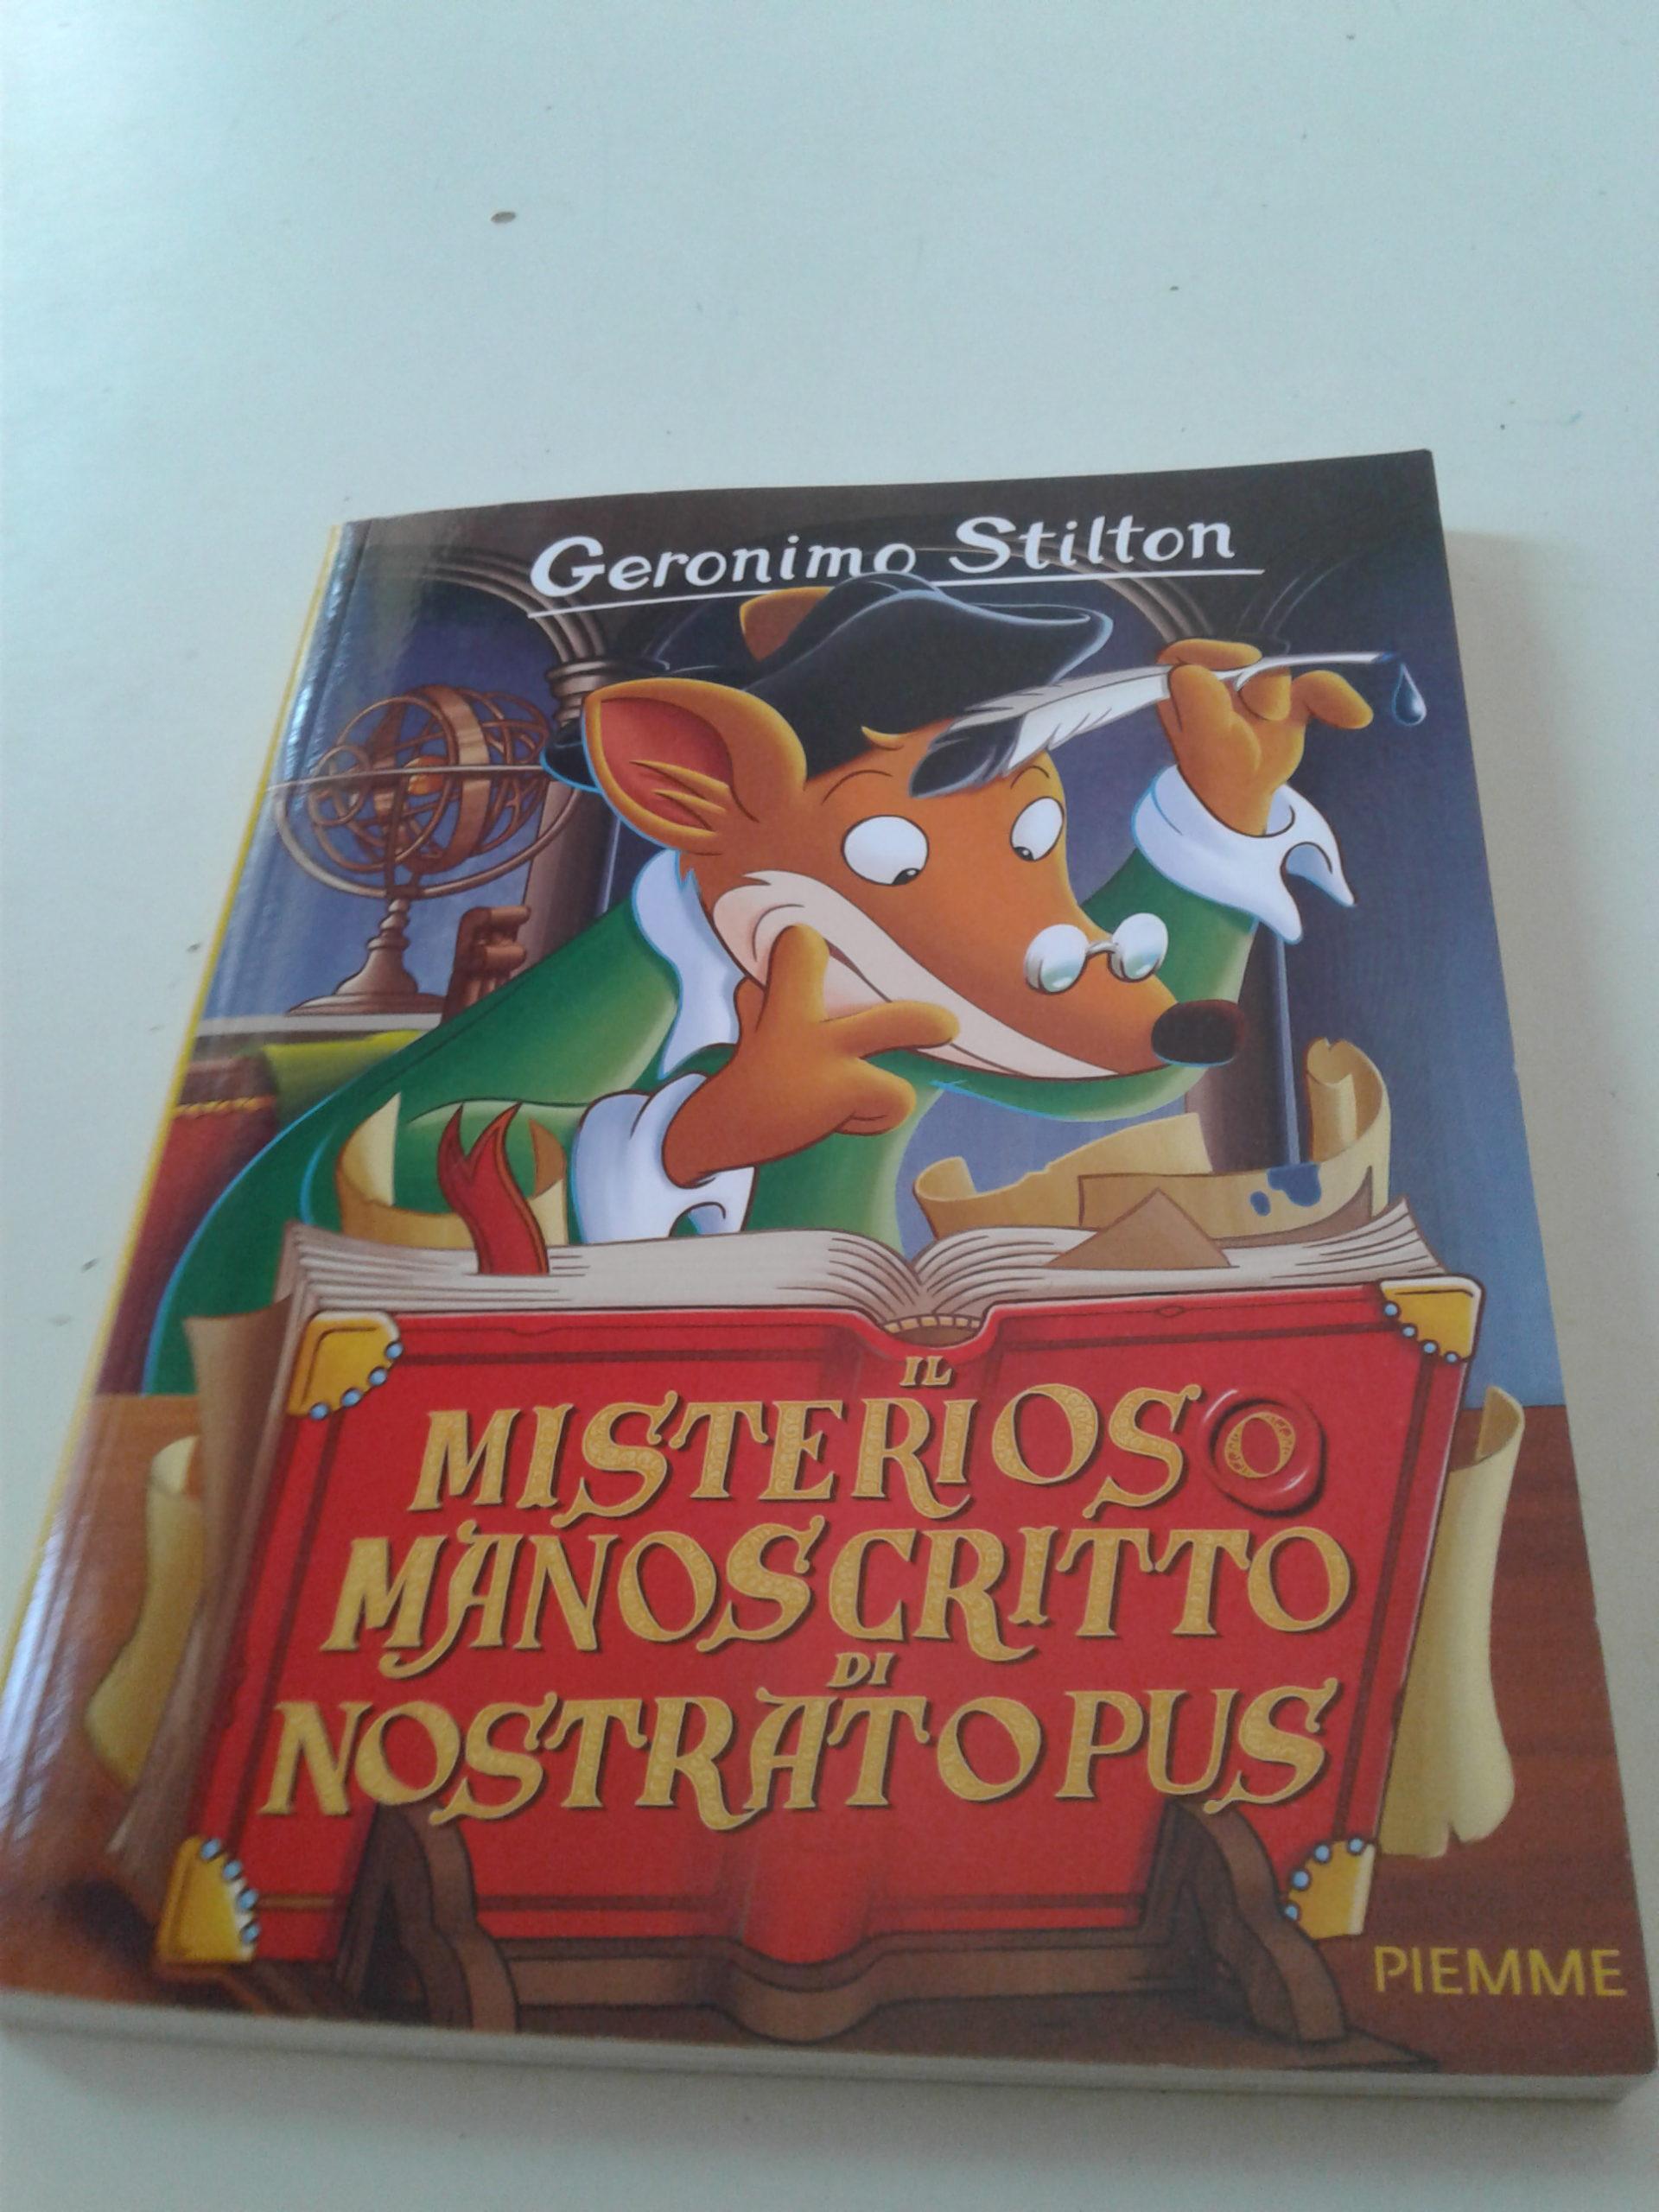 Geronimo Stilton Misterioso manoscritto